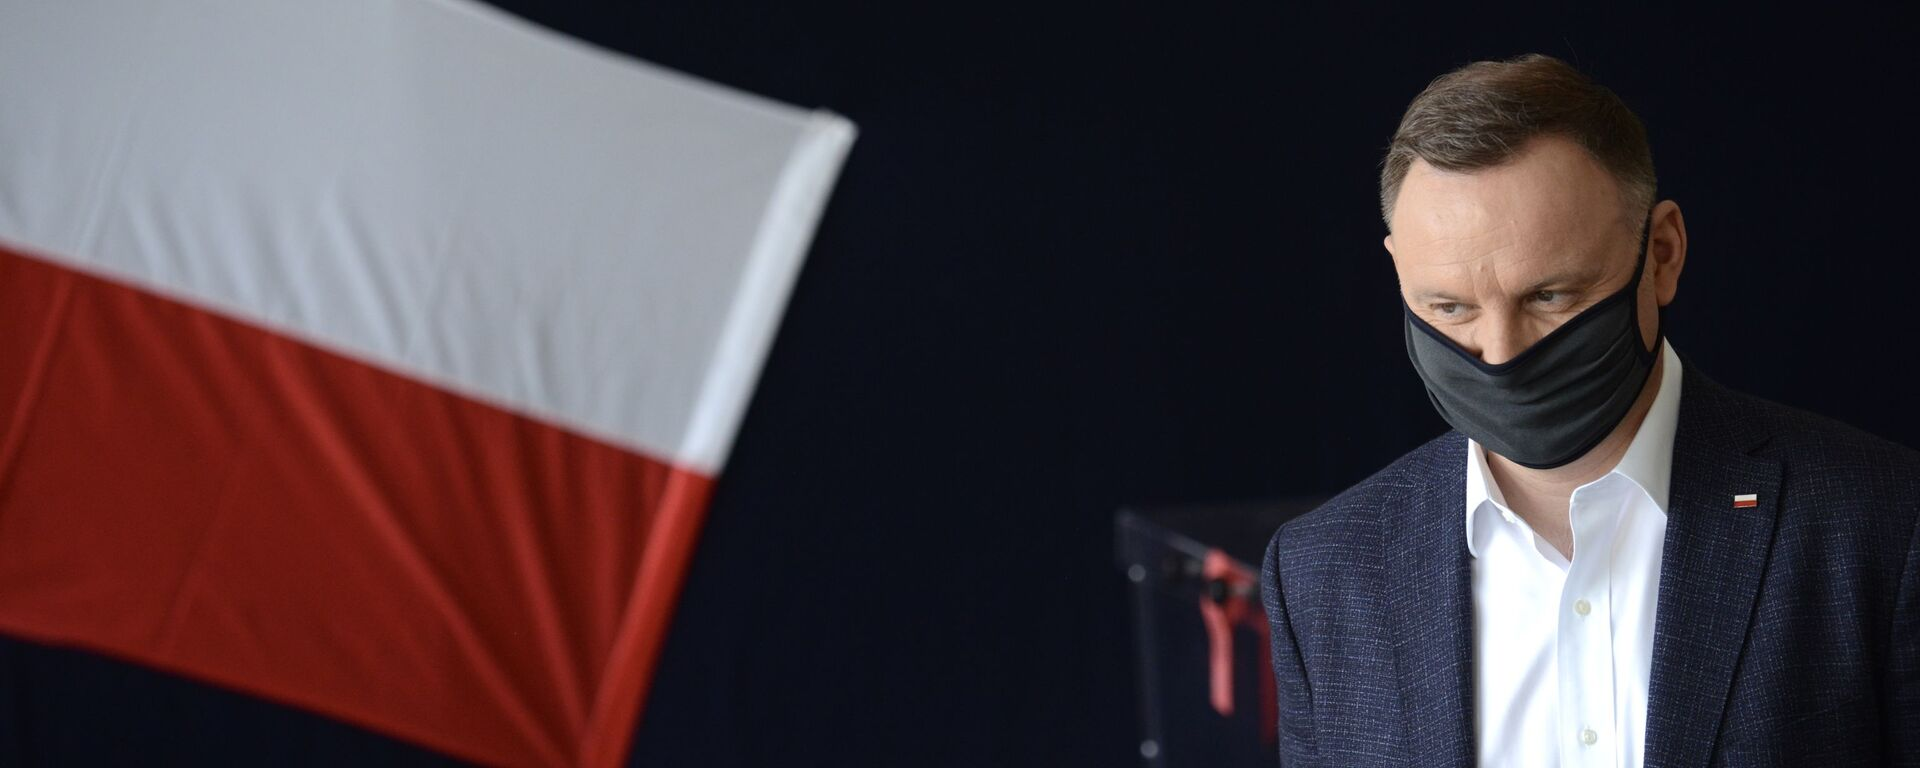 Prezydent RP Andrzej Duda - Sputnik Polska, 1920, 02.09.2021